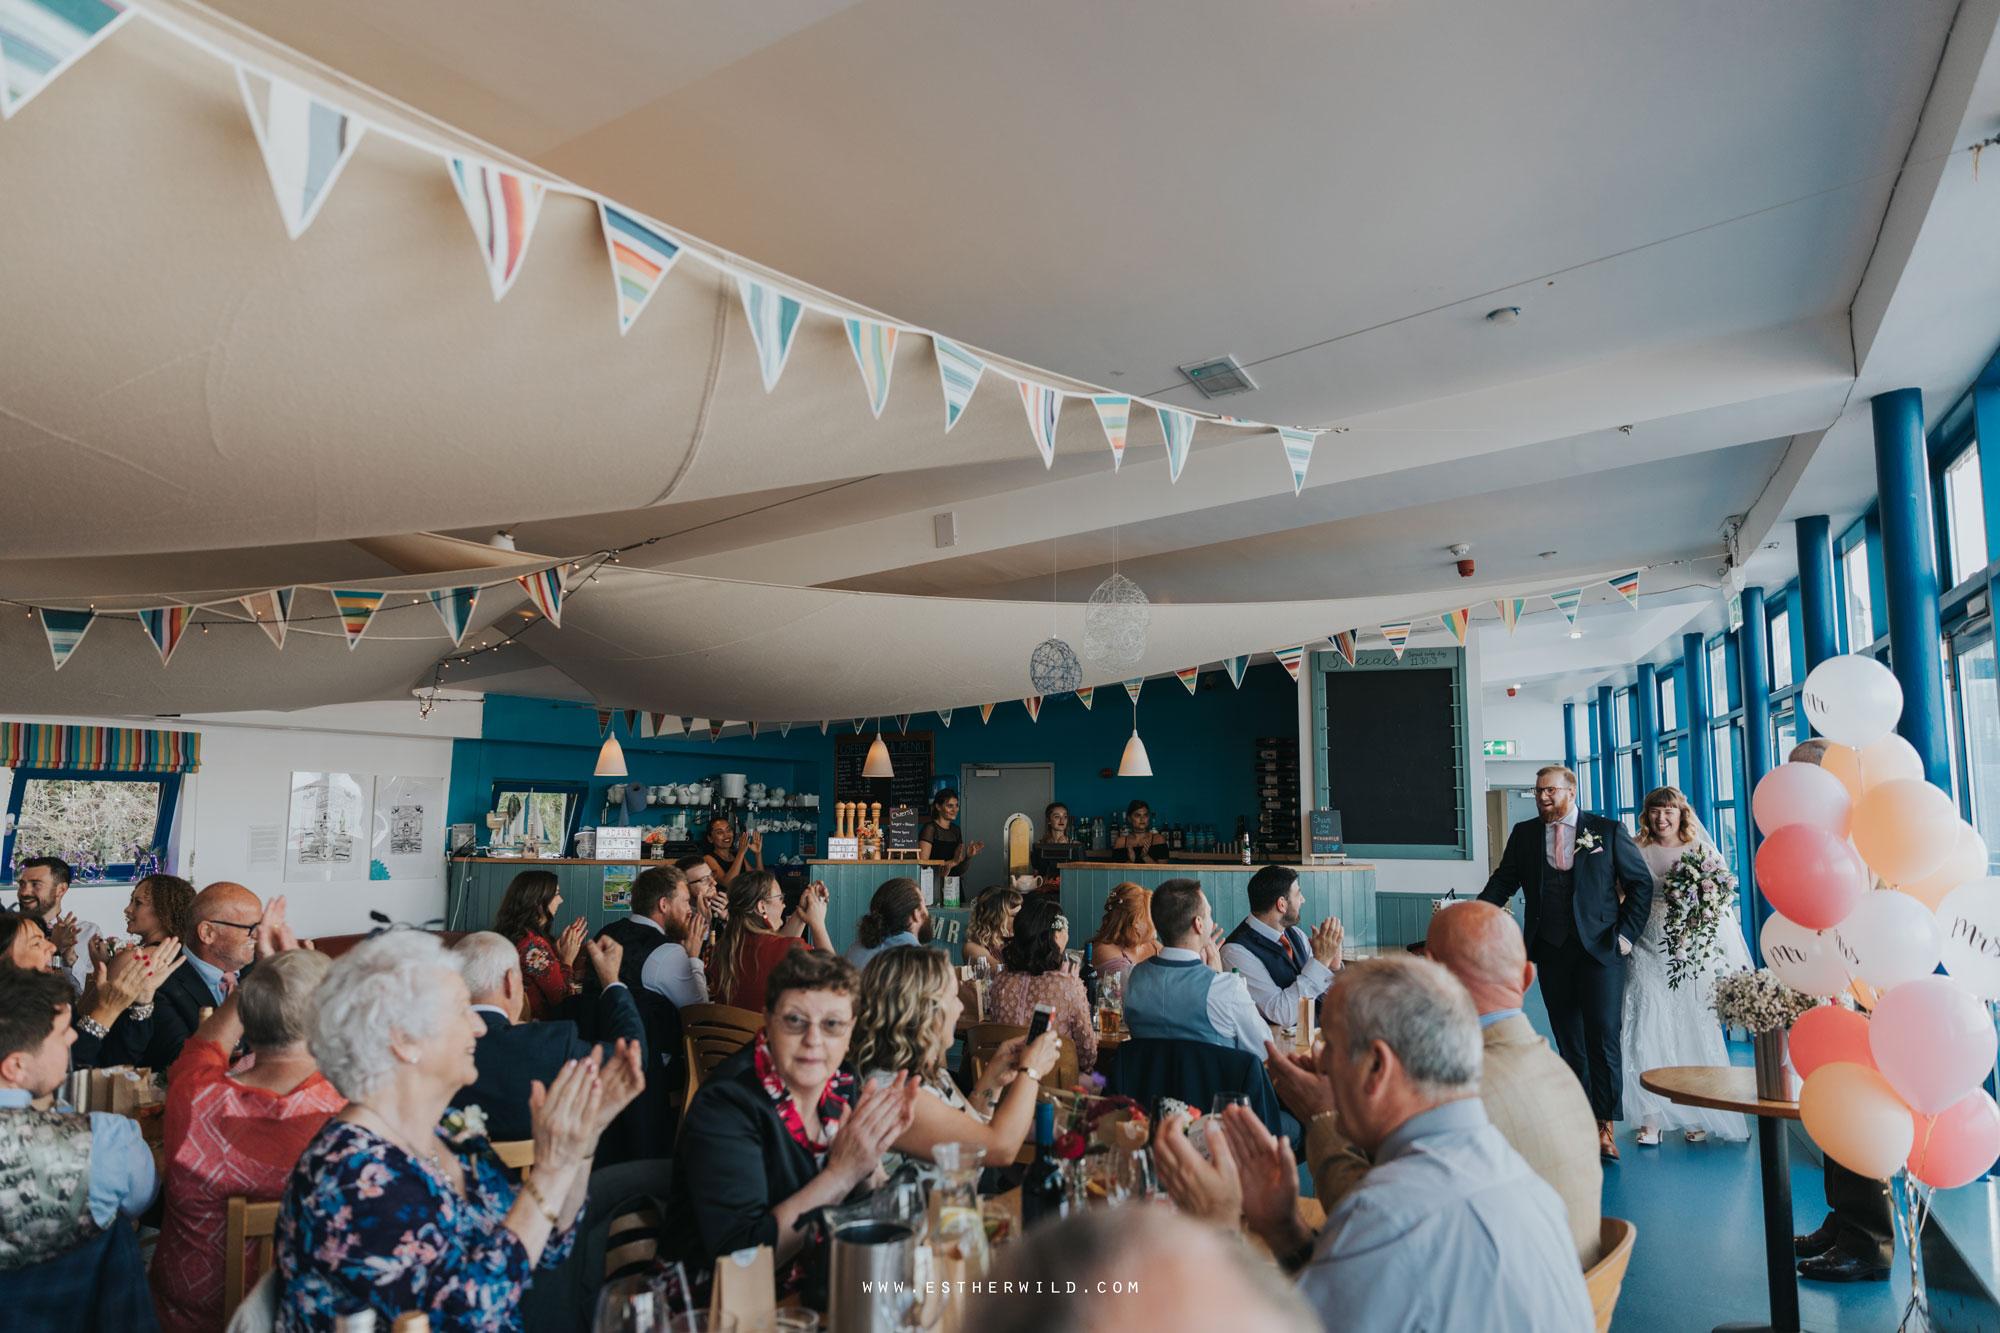 Cromer_Wedding_Beach_Outdoor_Ceremony_Norfolk_North_Lodge_Registry_Office_Rocket_House_Cafe_Cromer_Pier_IMG_4873.jpg